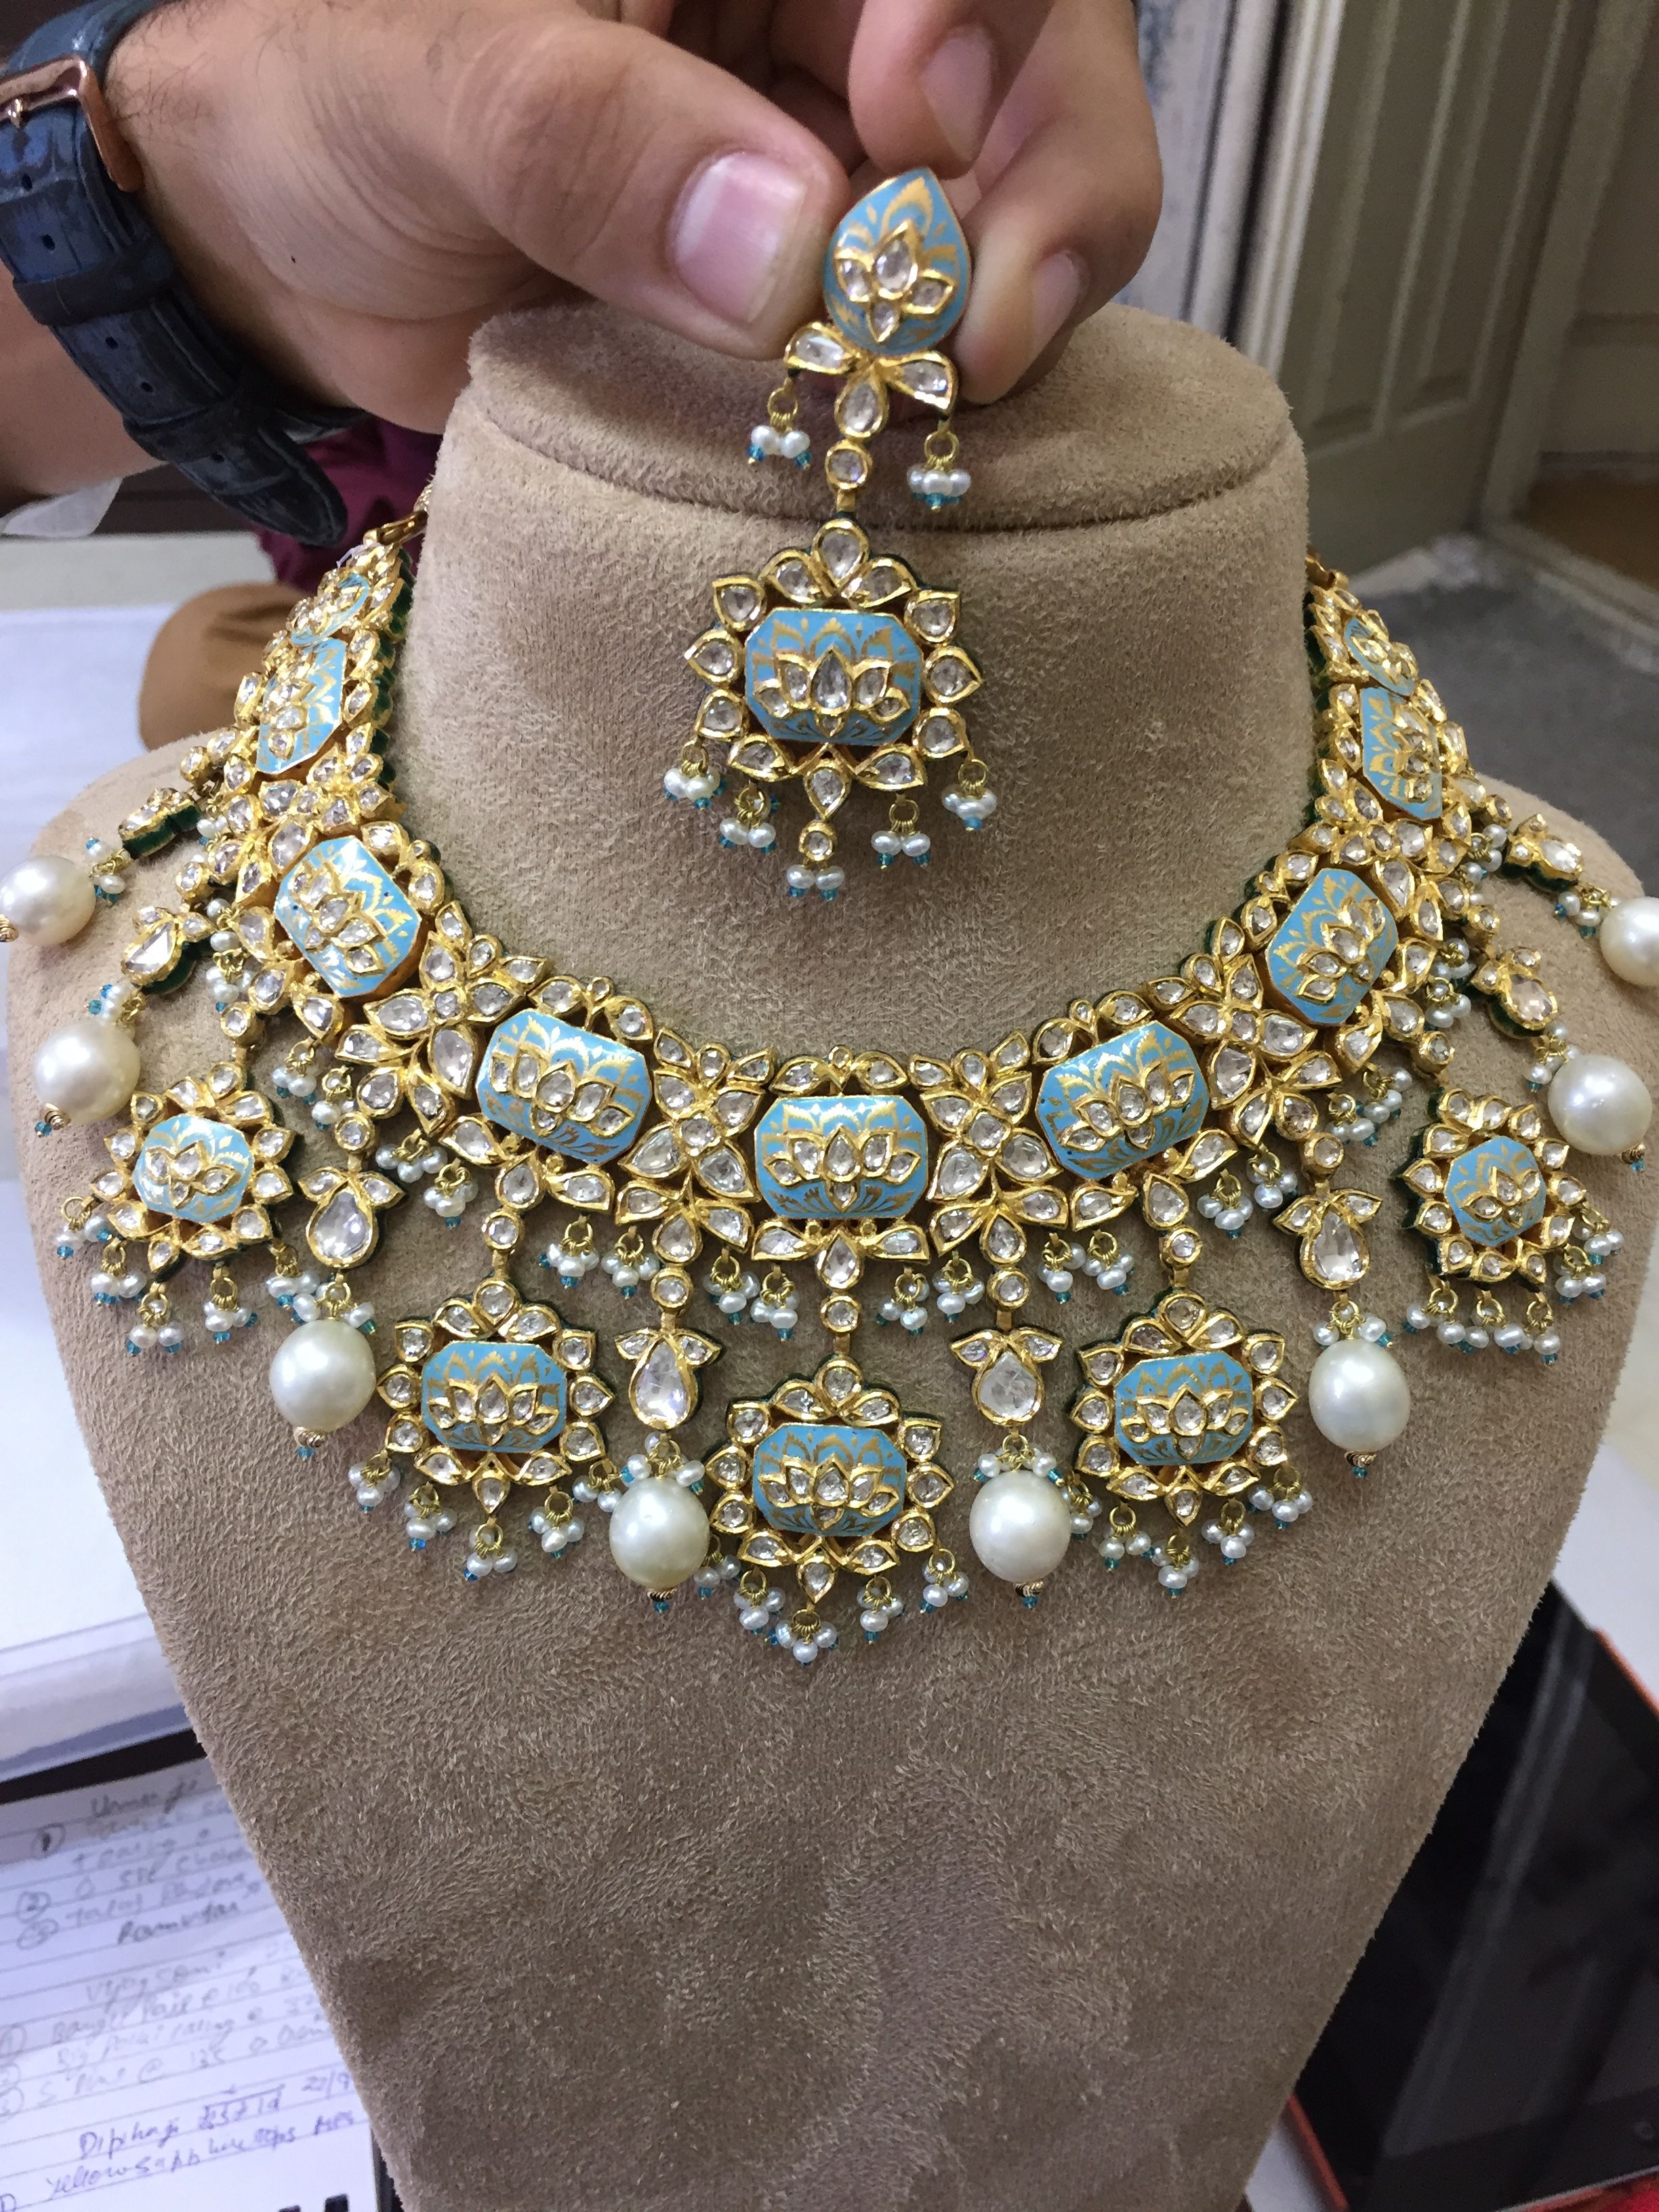 24ec1449ddfc0 Feroze Meena necklace with rose cut diamonds | necklaces in 2019 ...